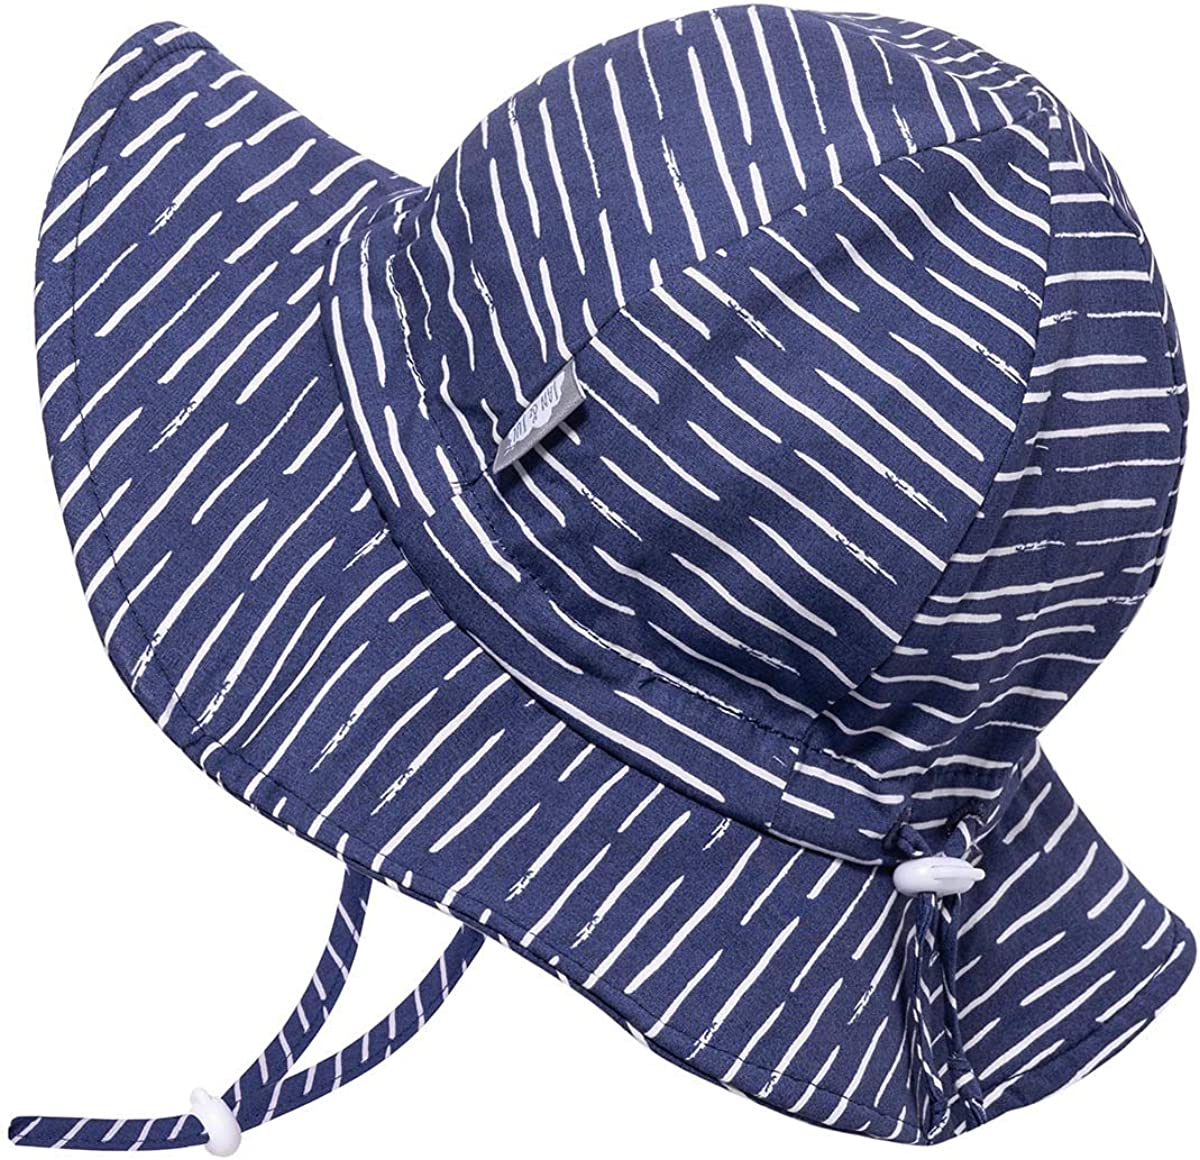 50+ UPF with Adjustable Strap for Baby Kids Toddler Jan /& Jul Unisex Cotton Floppy Sun-Hat